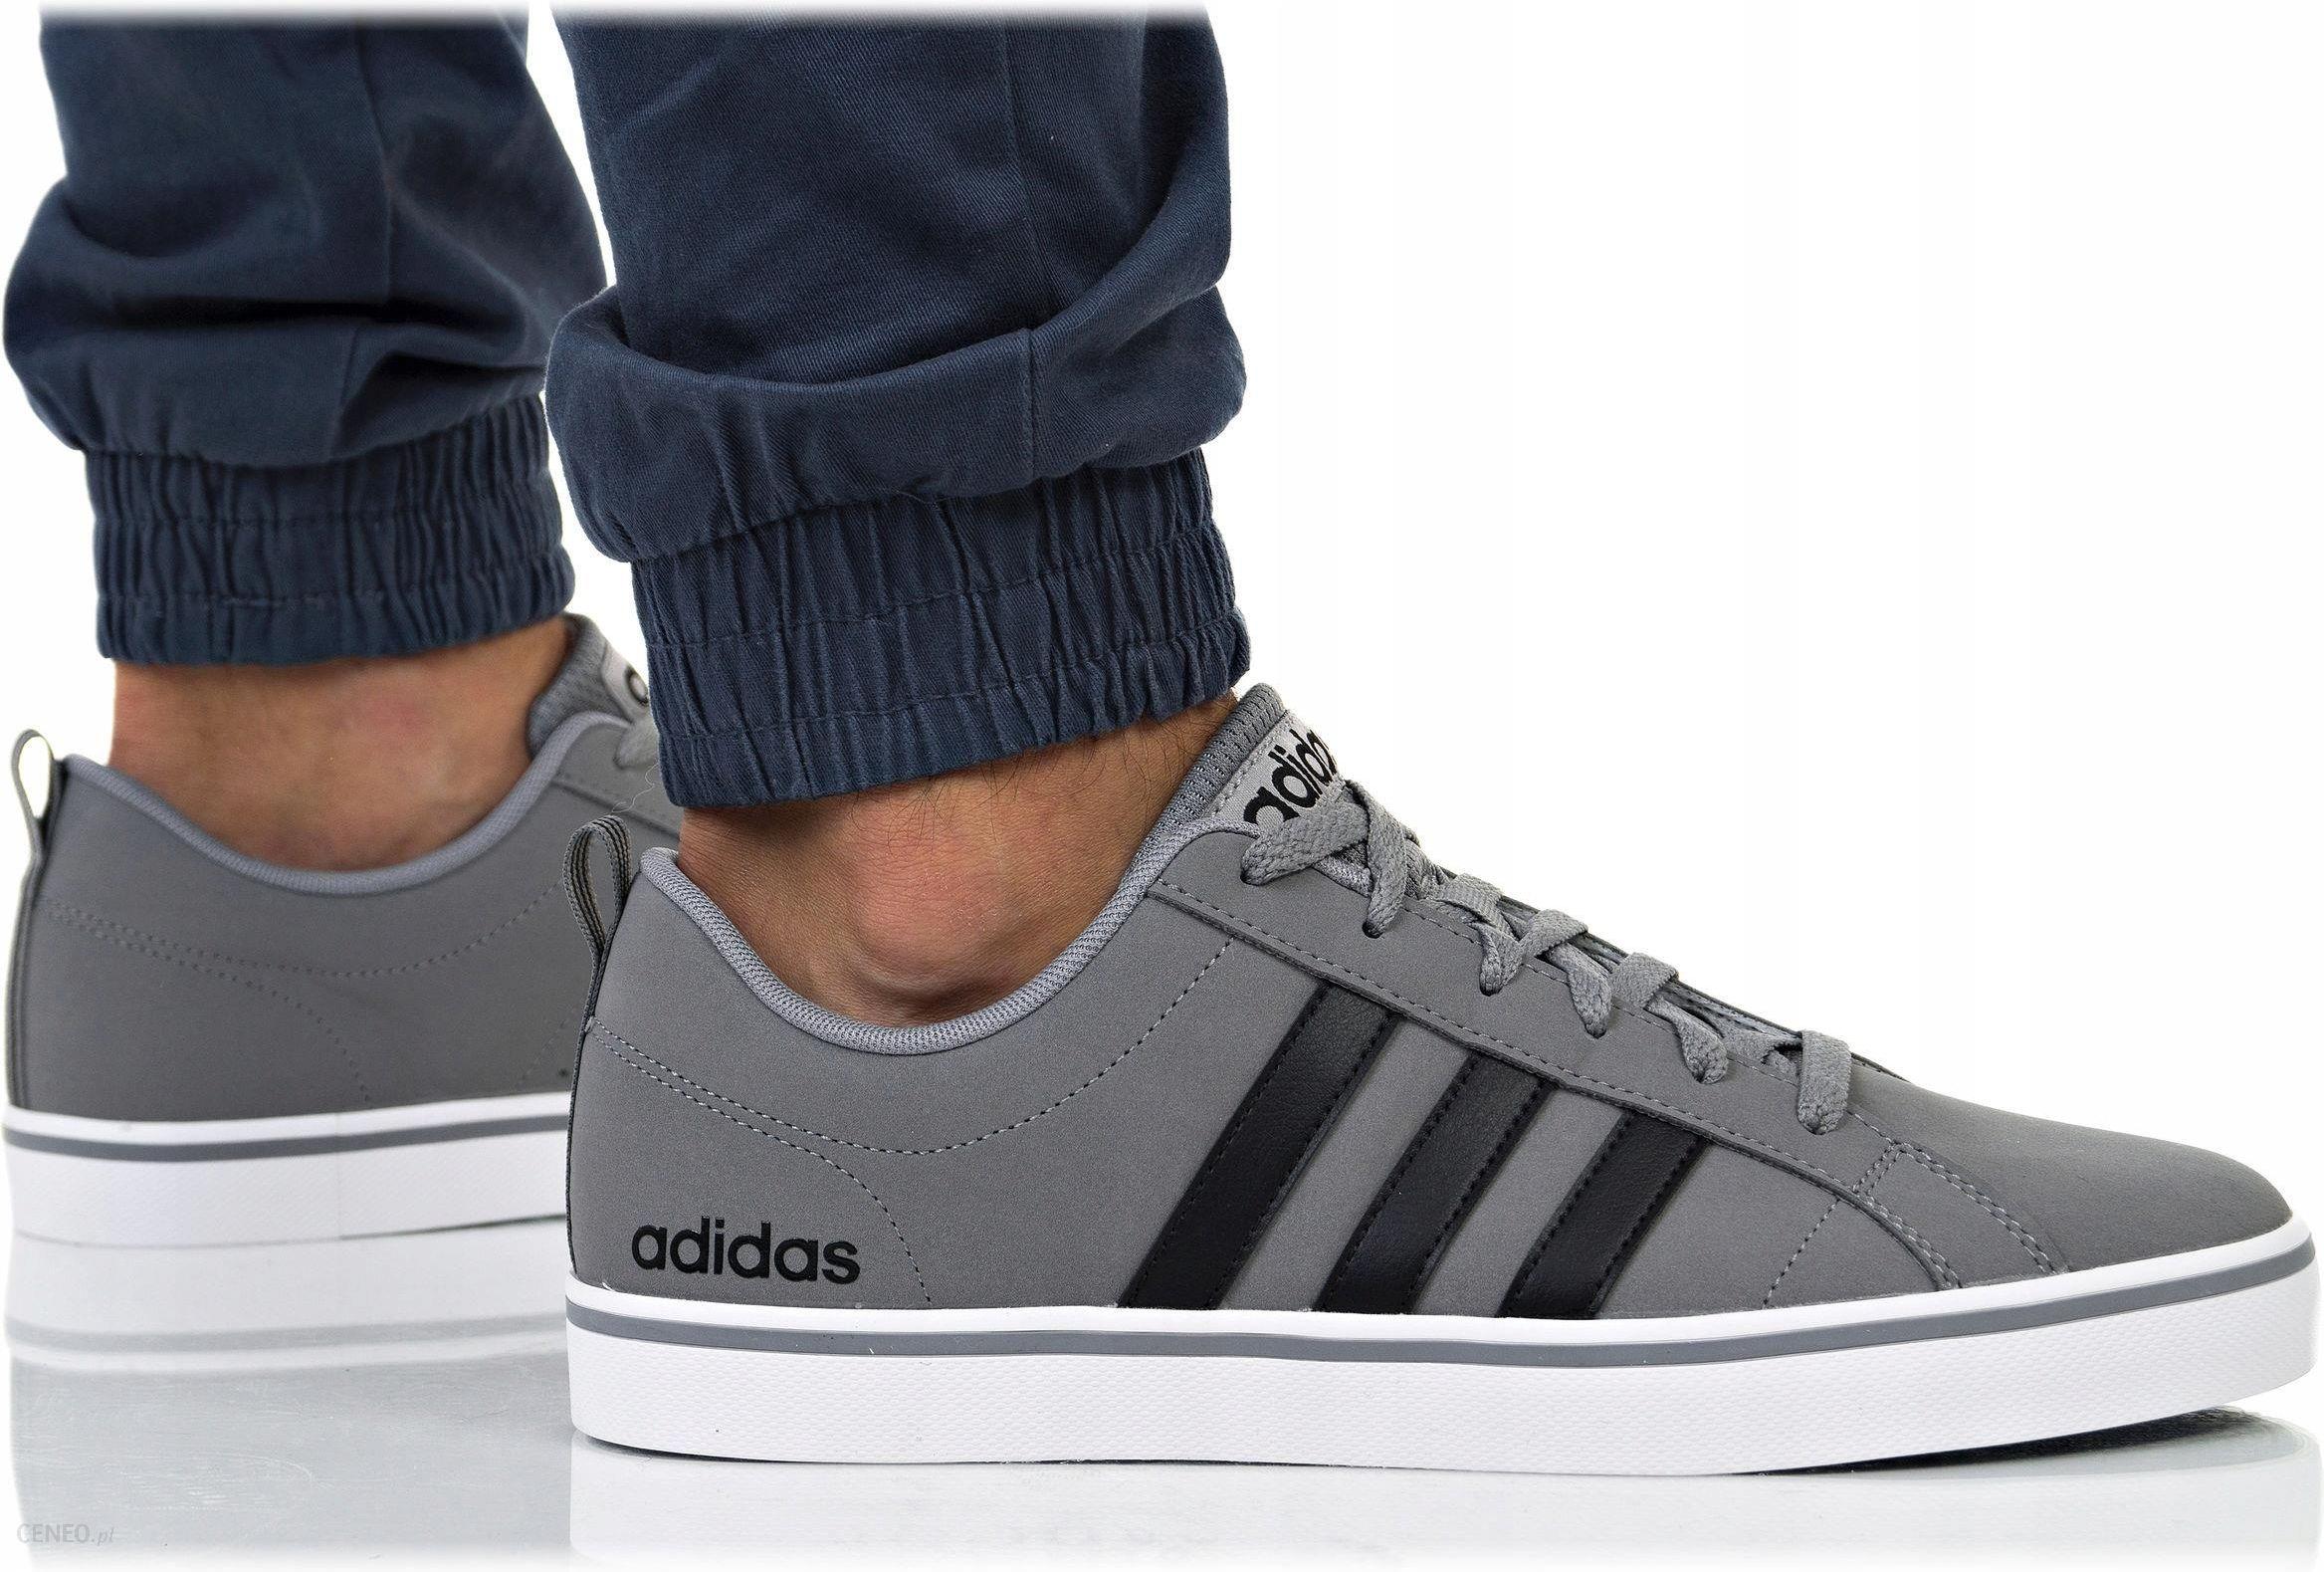 szare buty adidas męskie